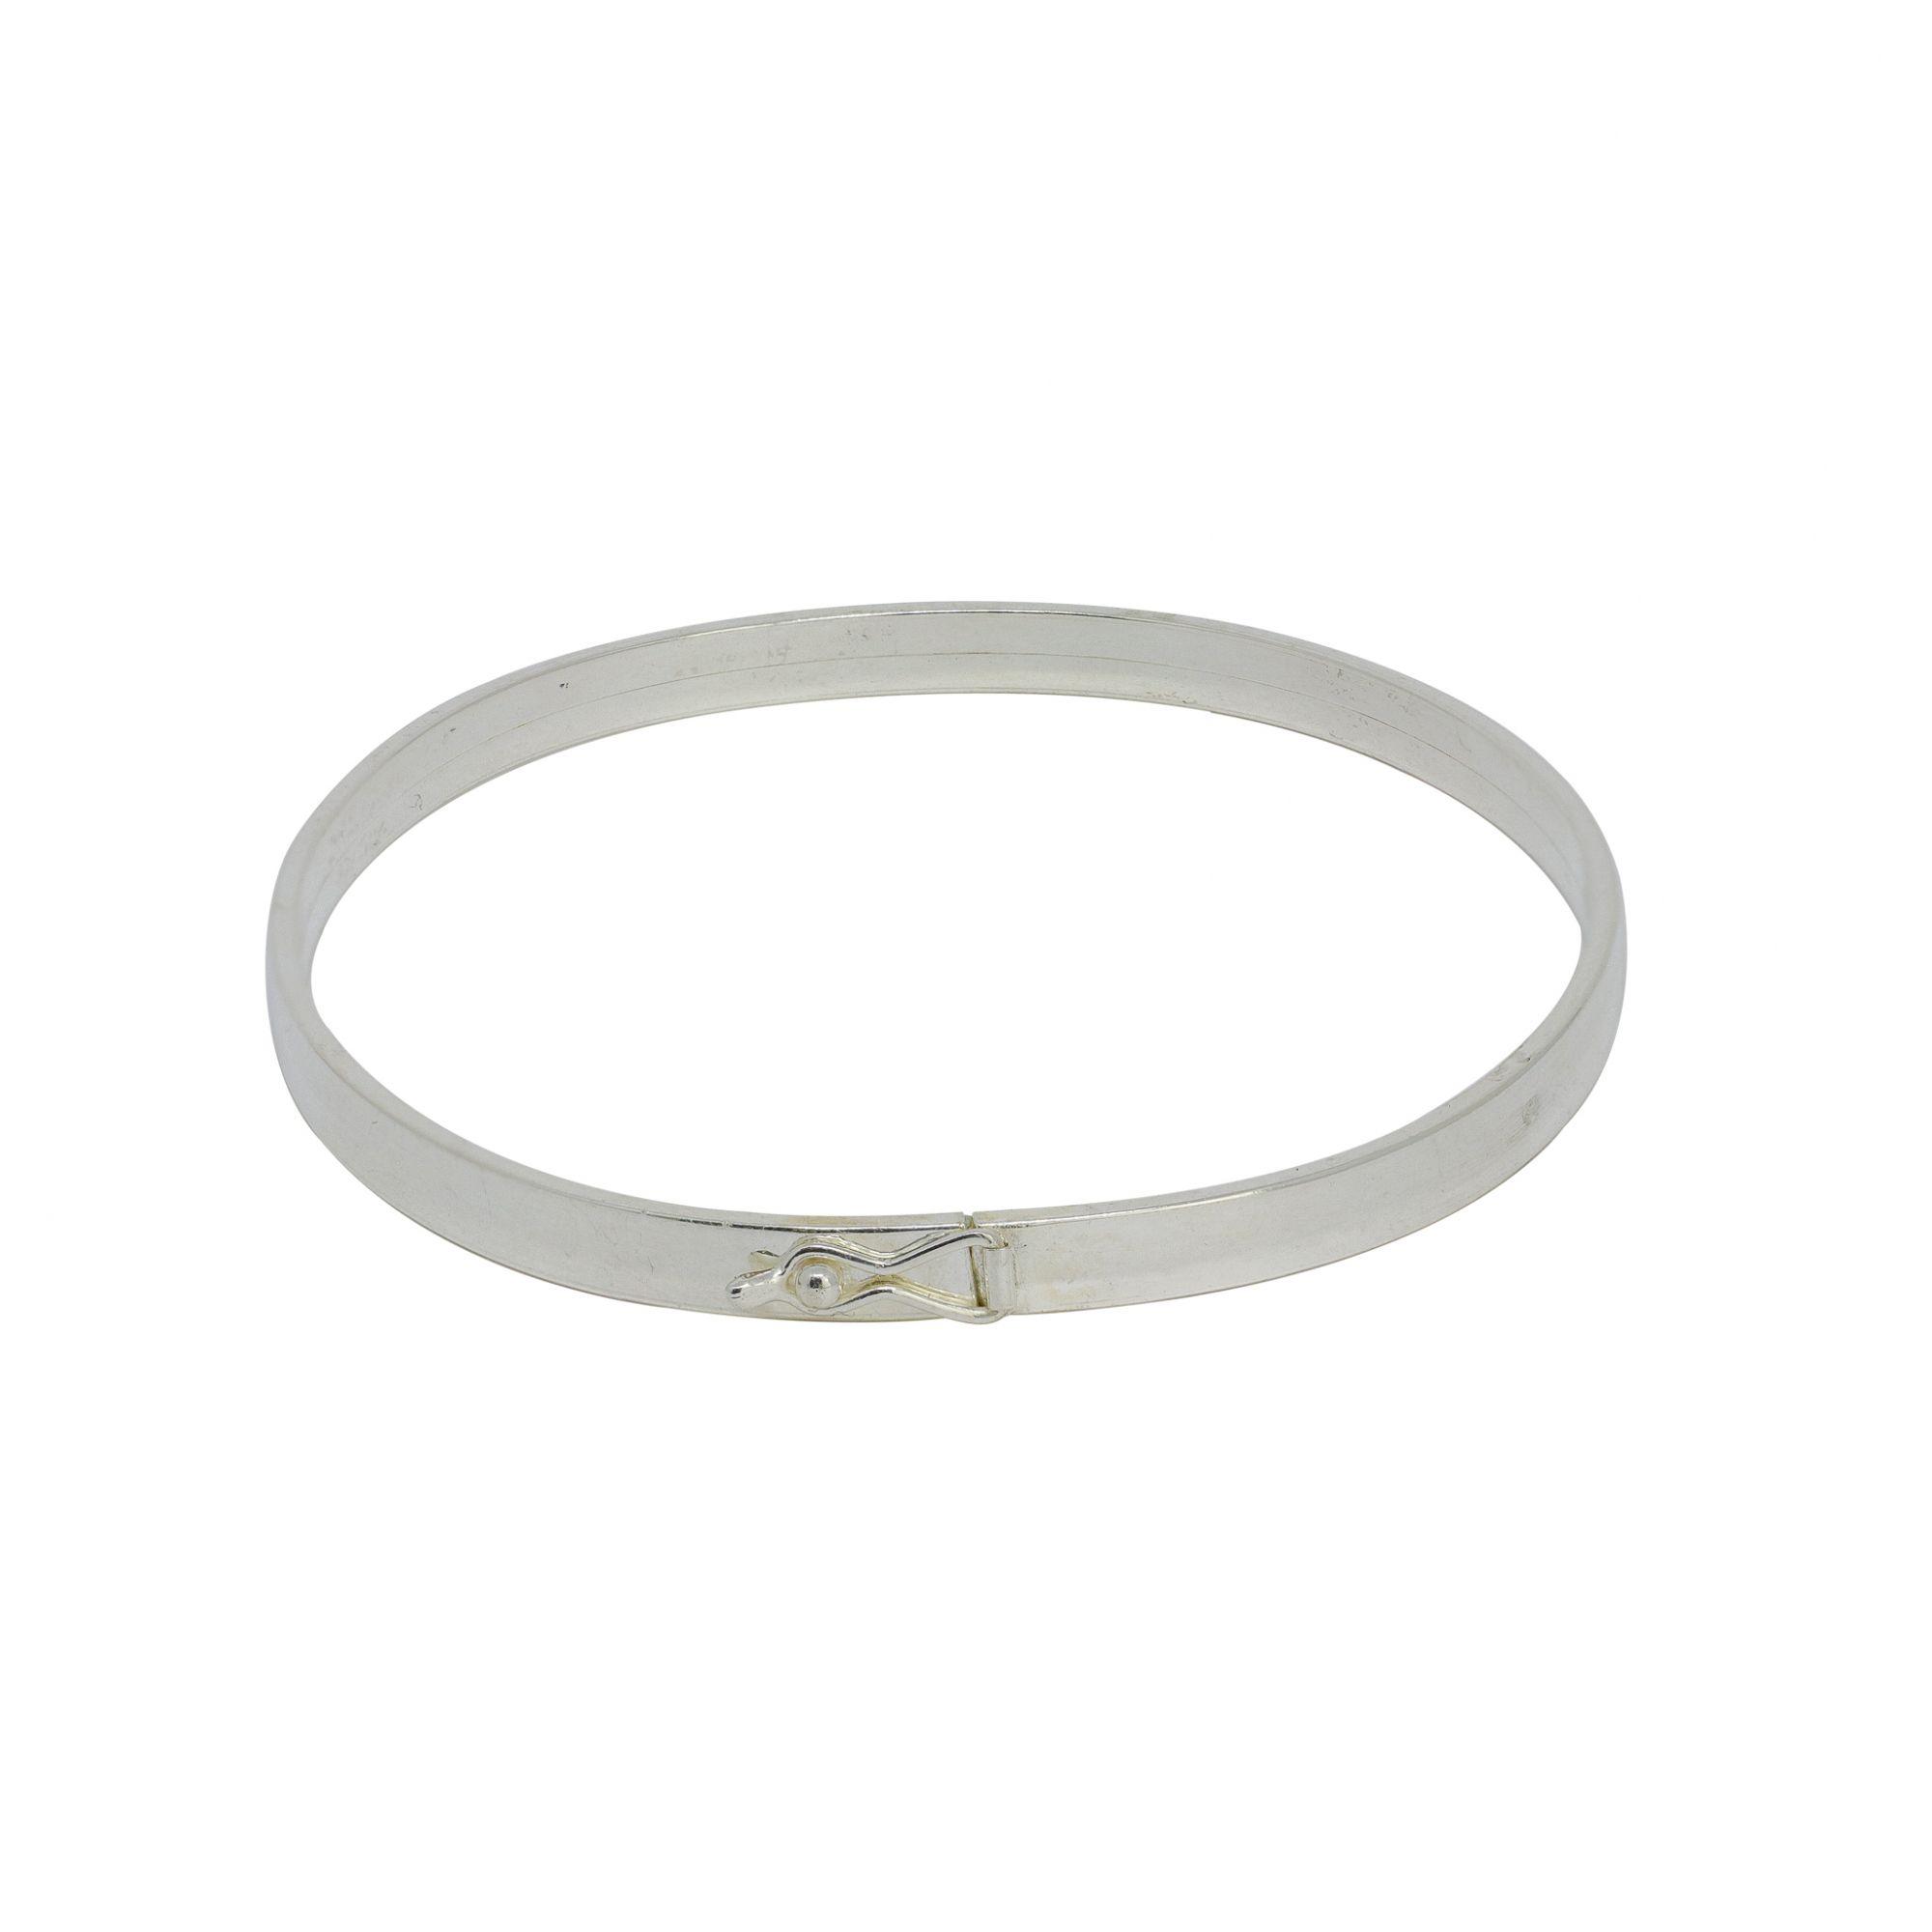 Bracelete prata 925 oco fio chato 4mm